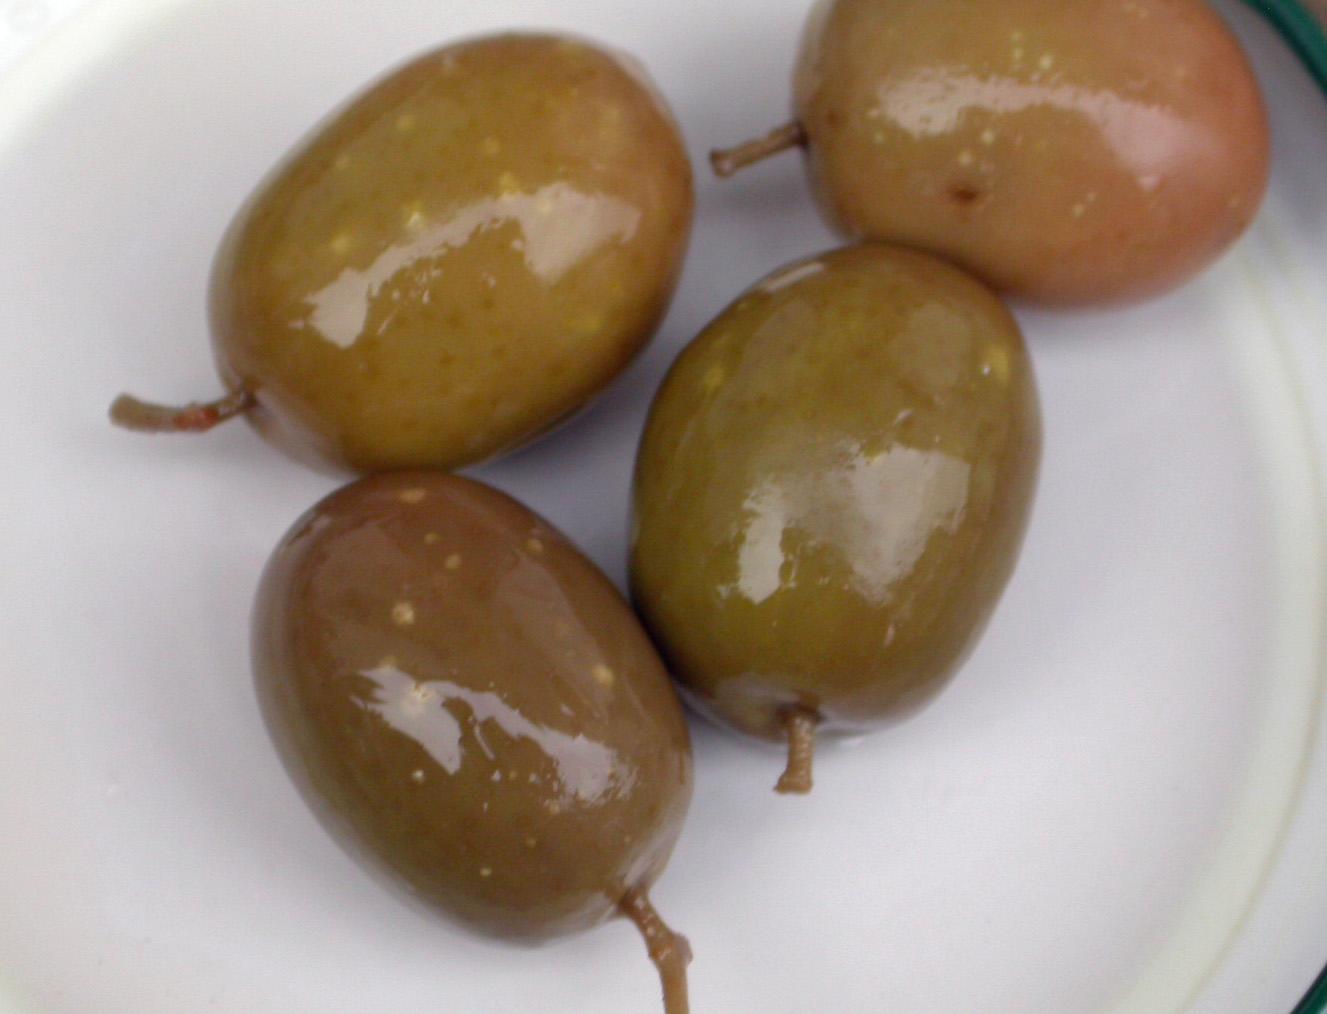 Aceitunas, manchas circulares blanca